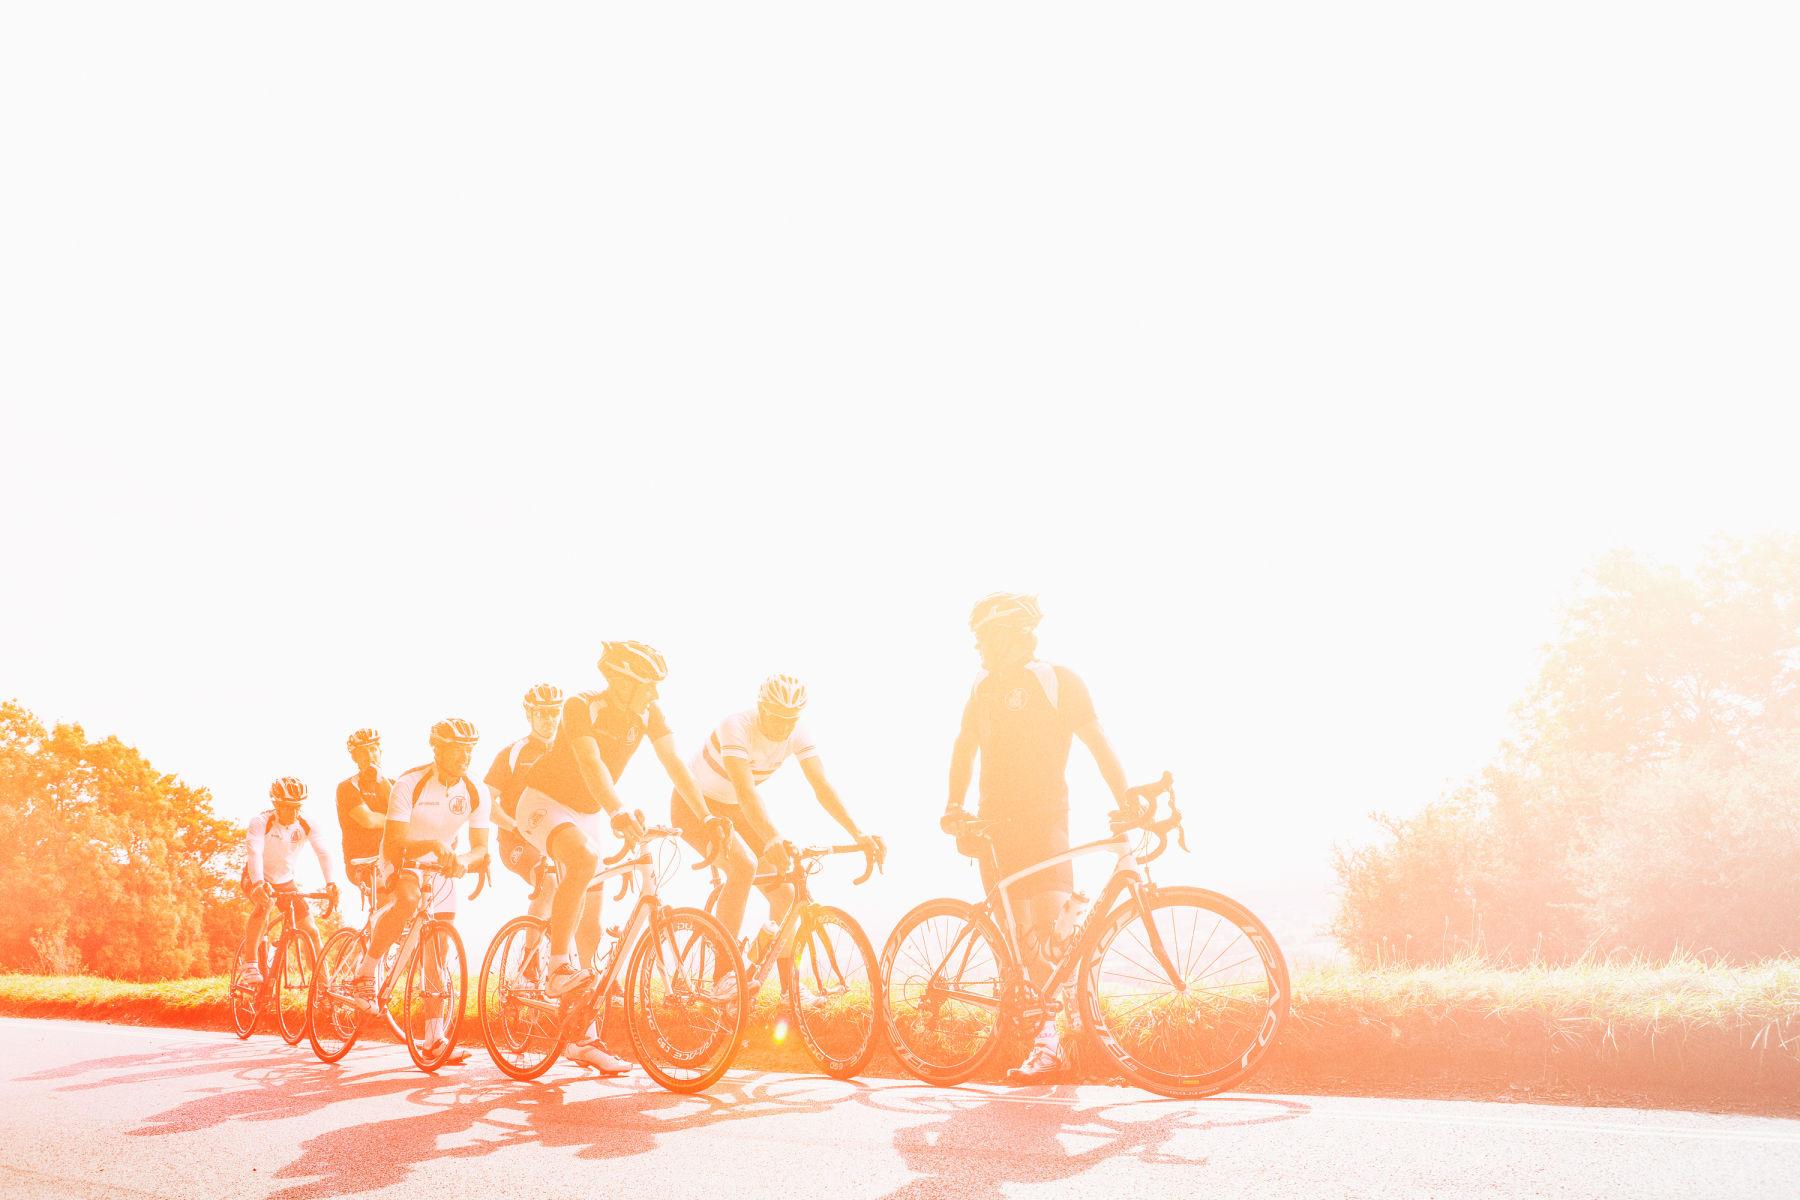 Paul-Calver-goodfromyou-4-Cyclist.jpg